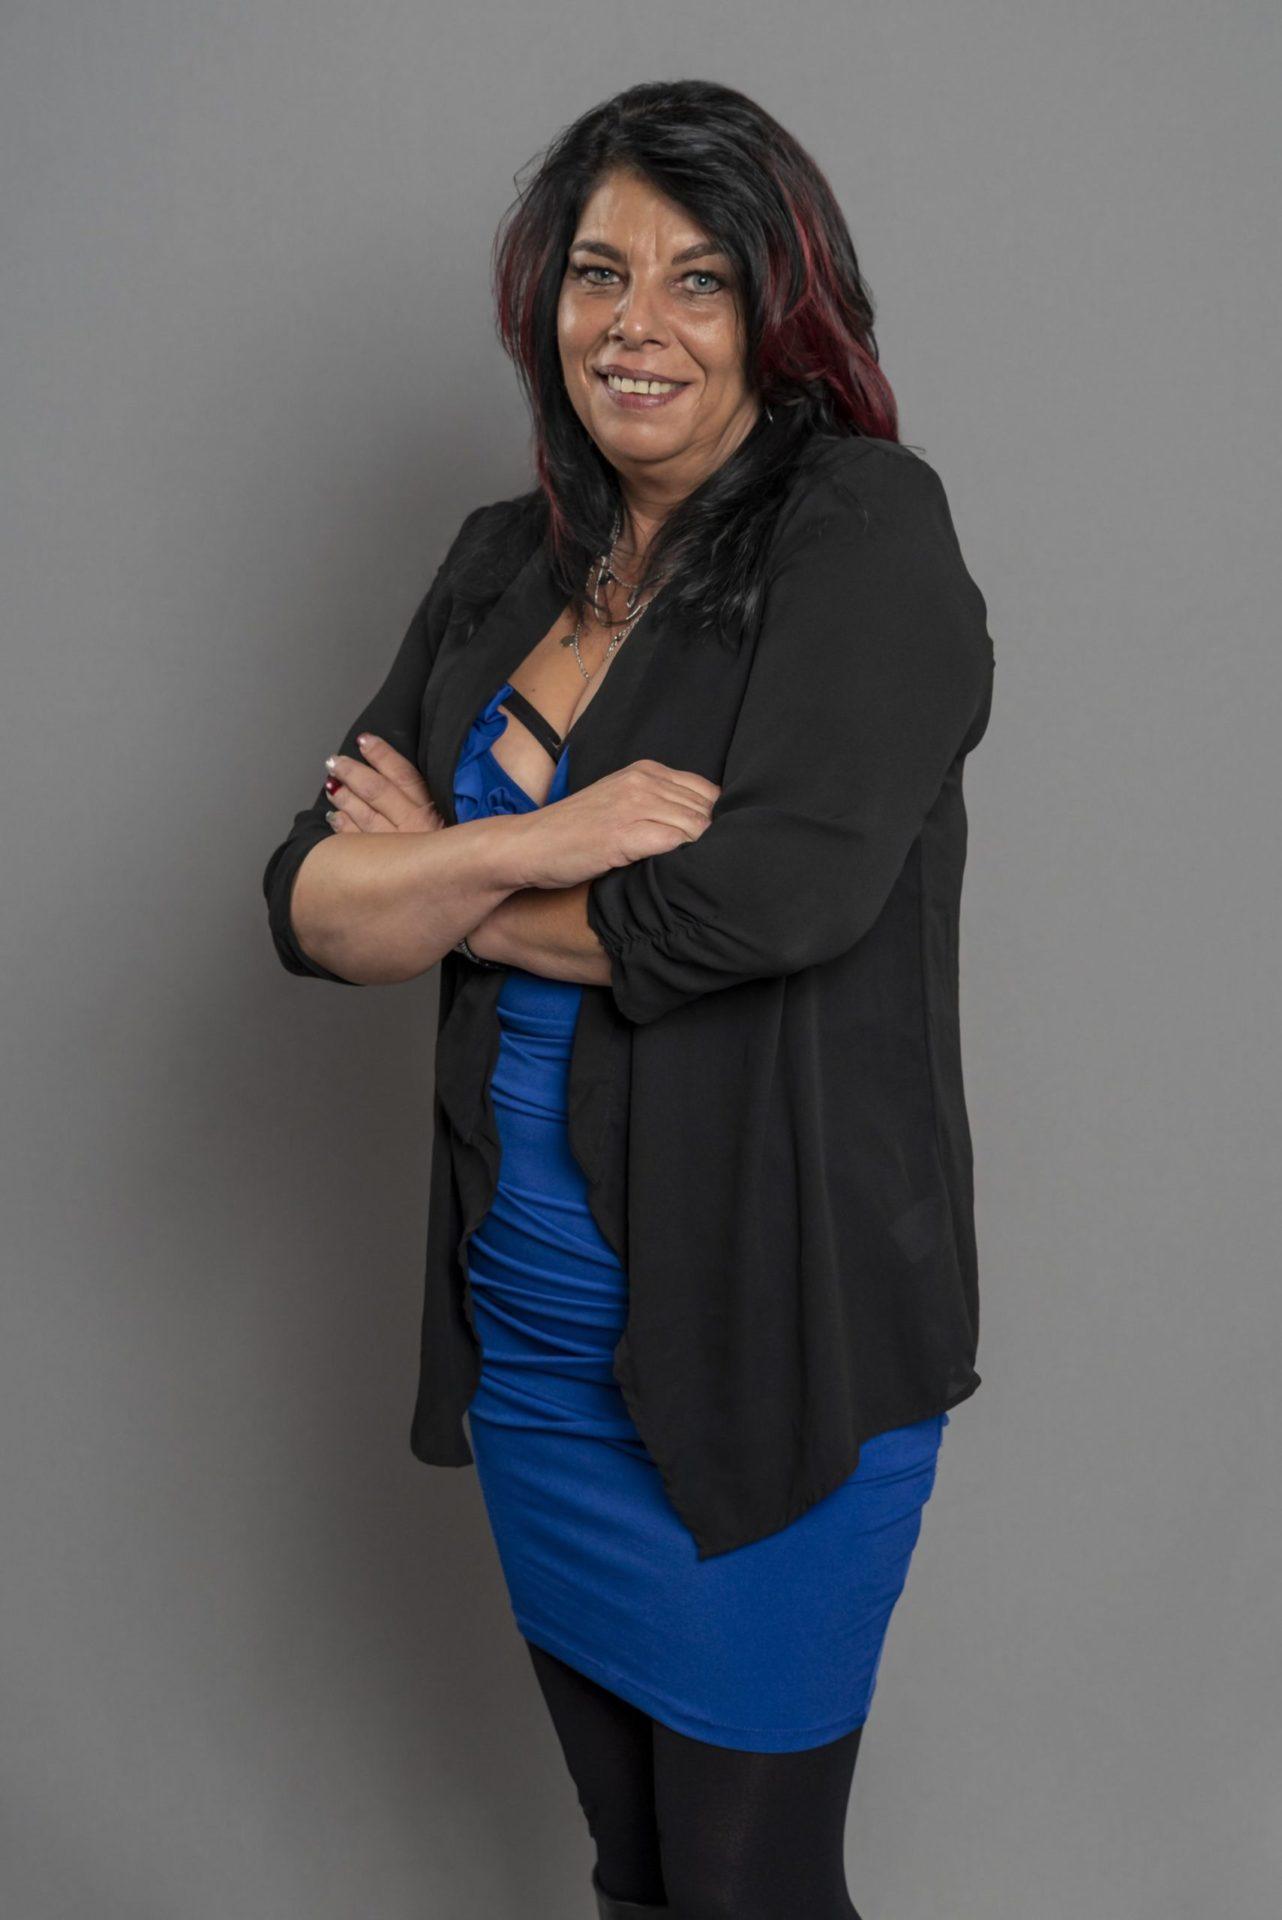 Brenda Doucette - Staff